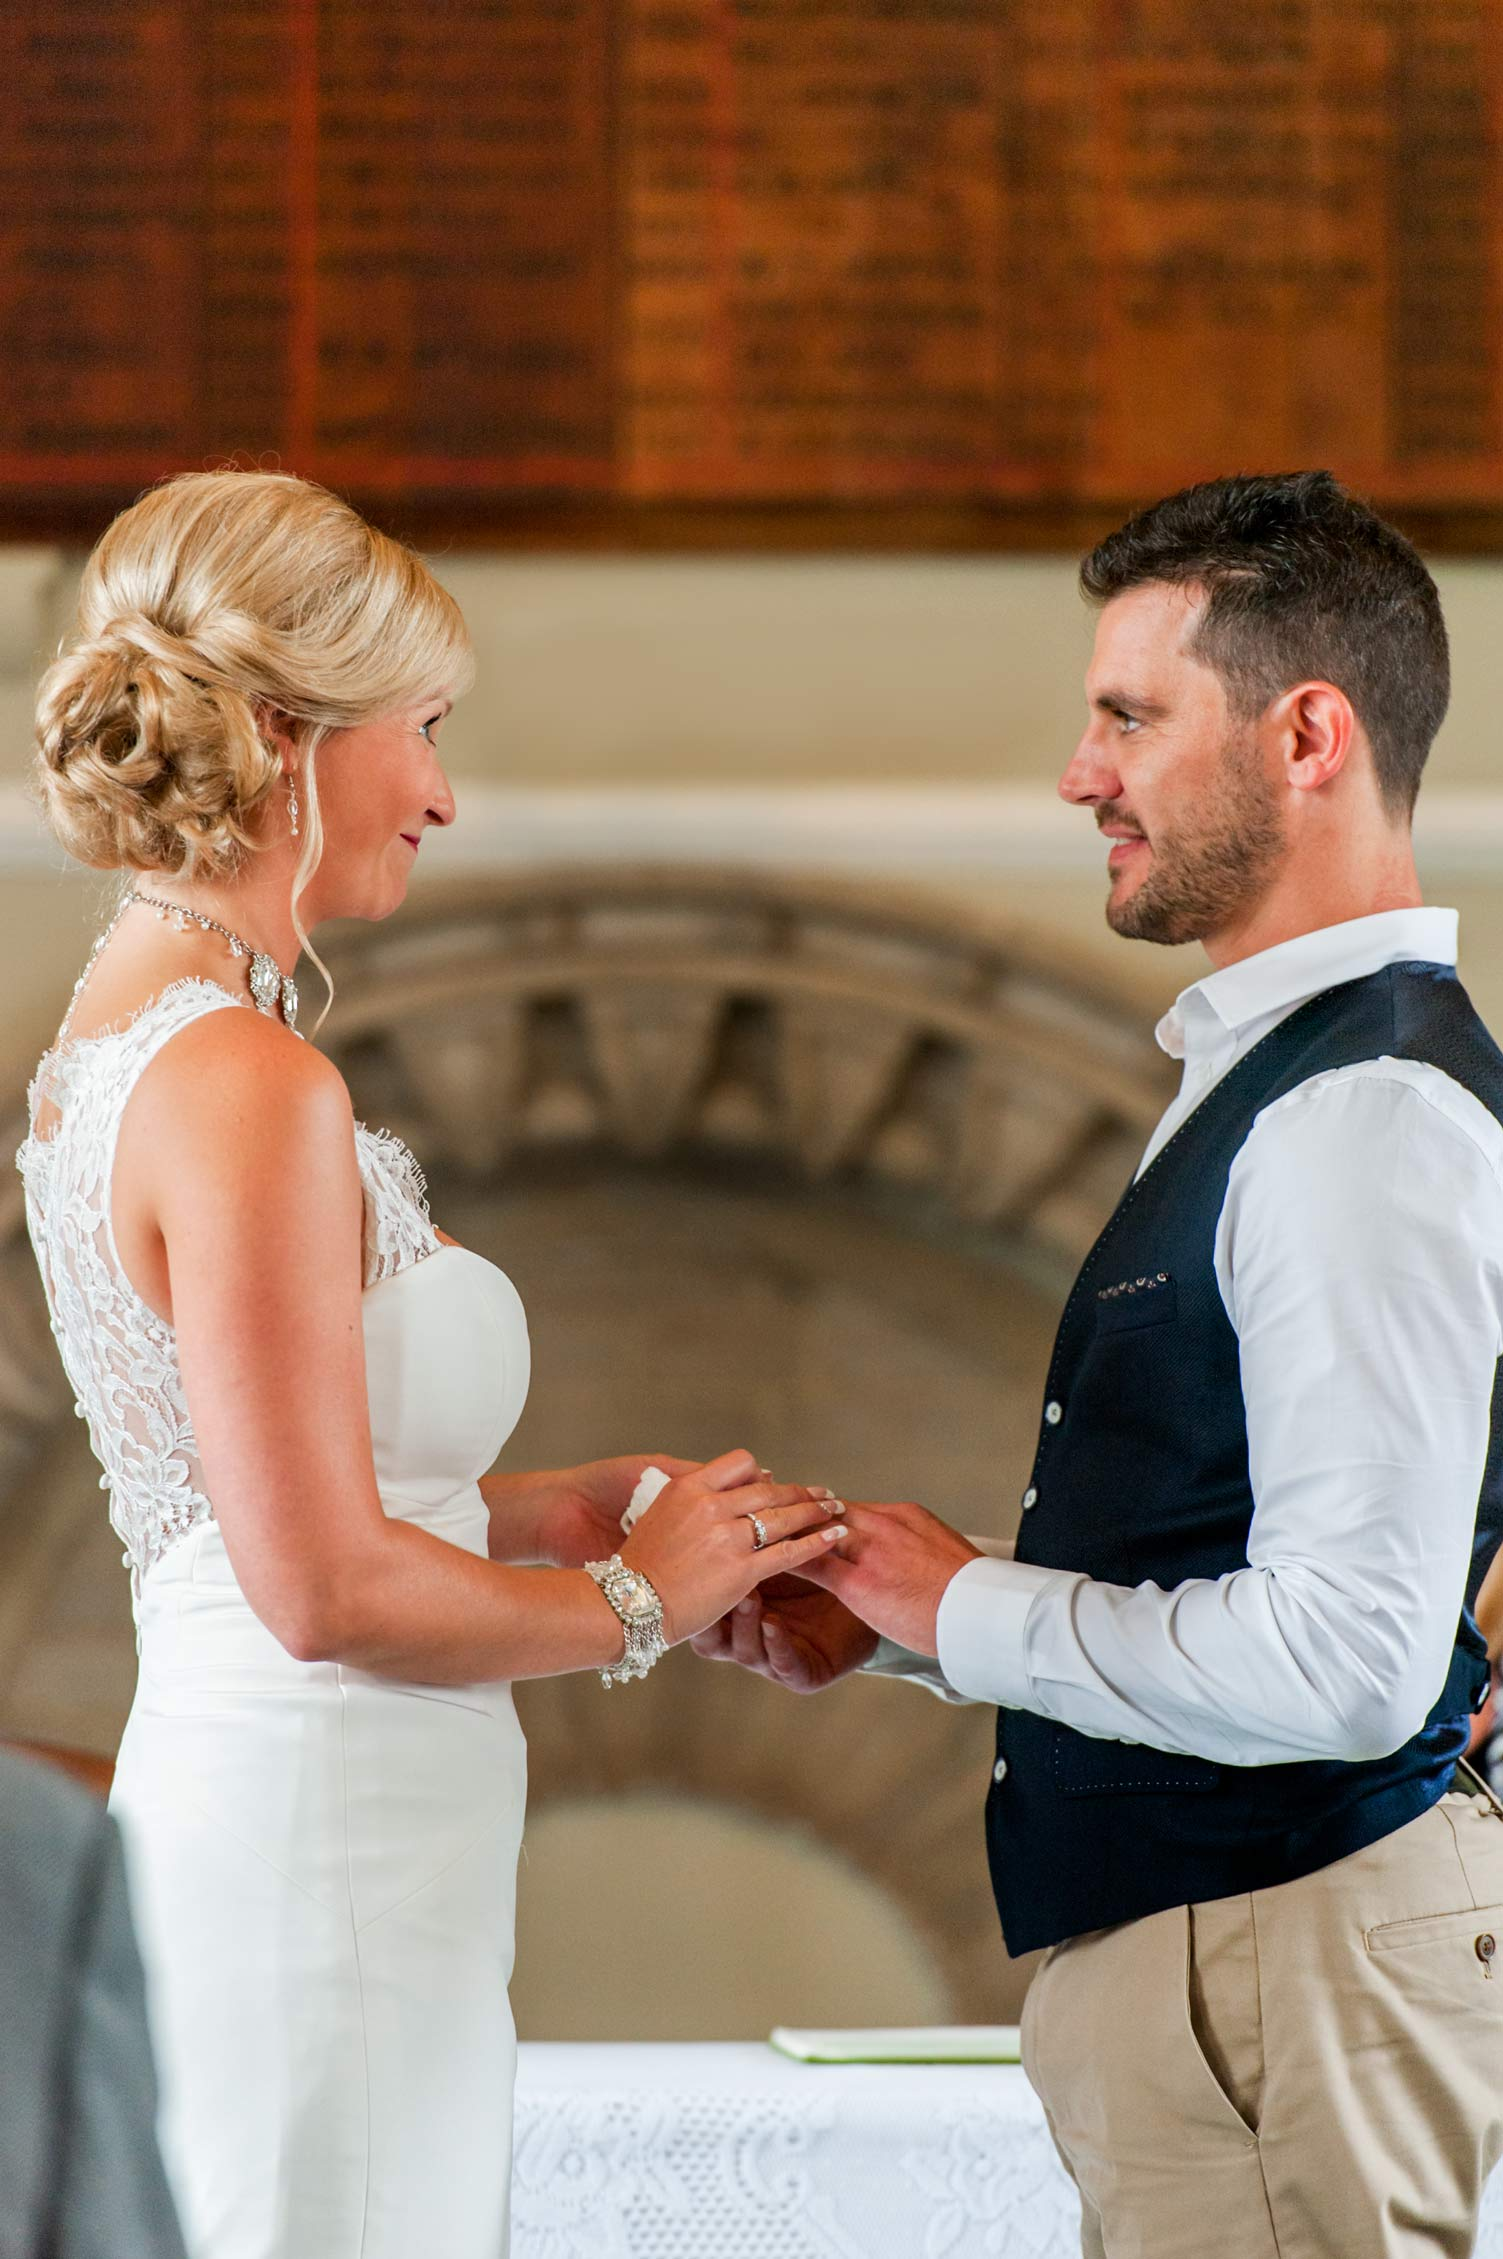 Arundel Town Hall wedding by Sussex documentary wedding photographer James Robertshaw